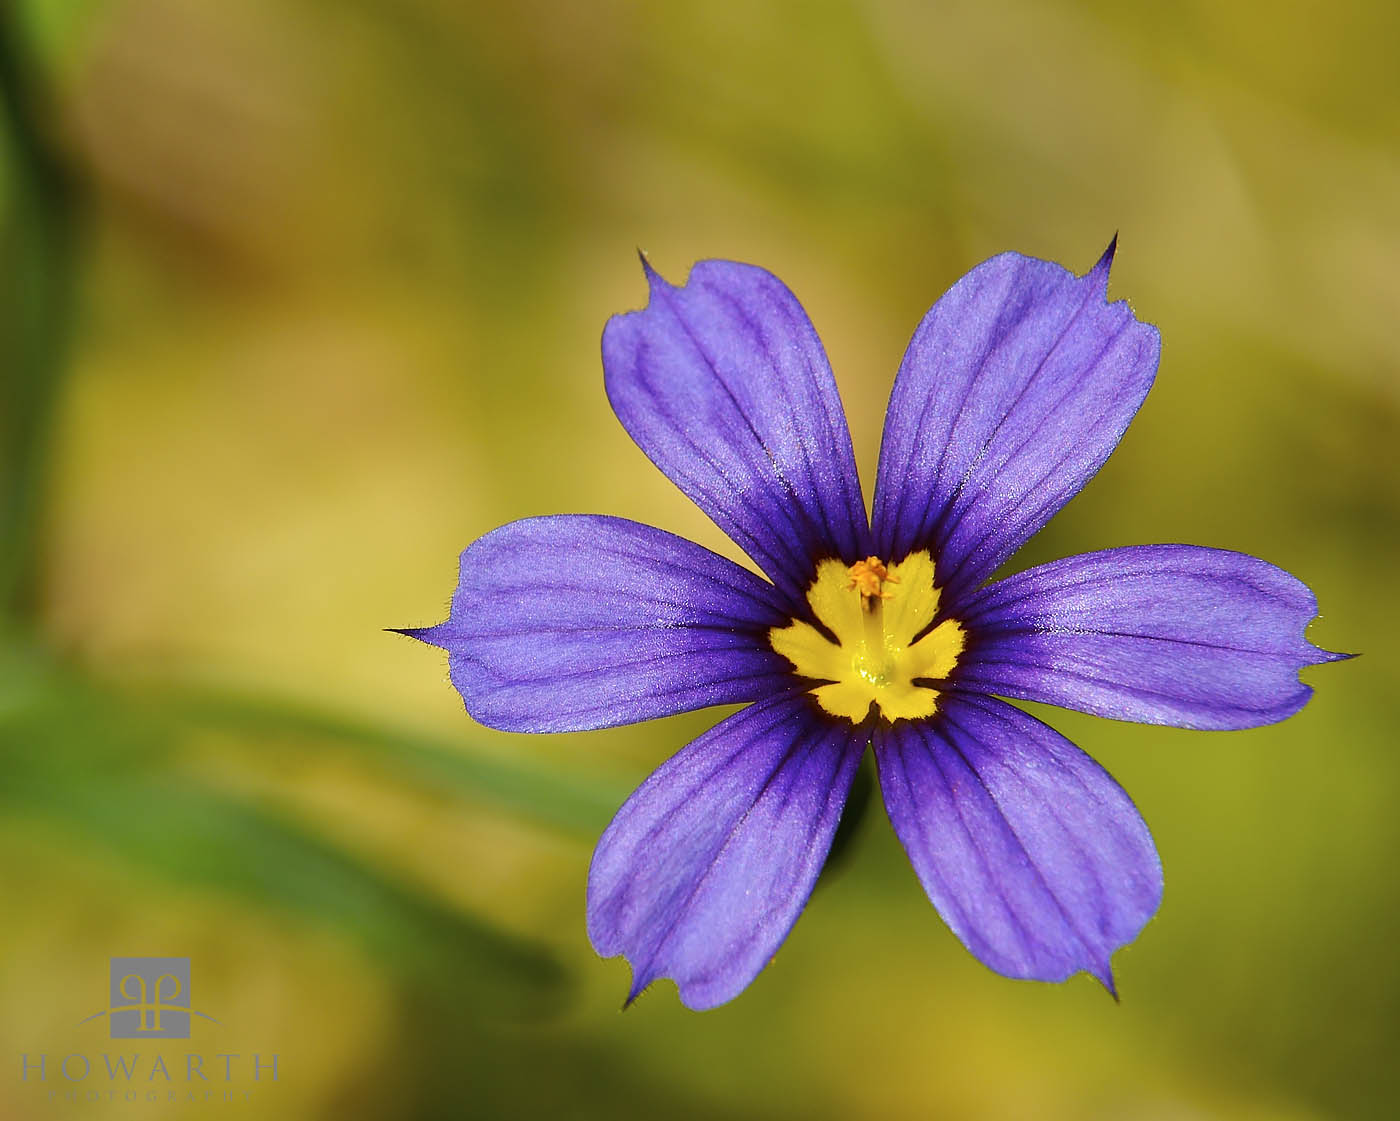 bermudiana, national, flower, spring, photo